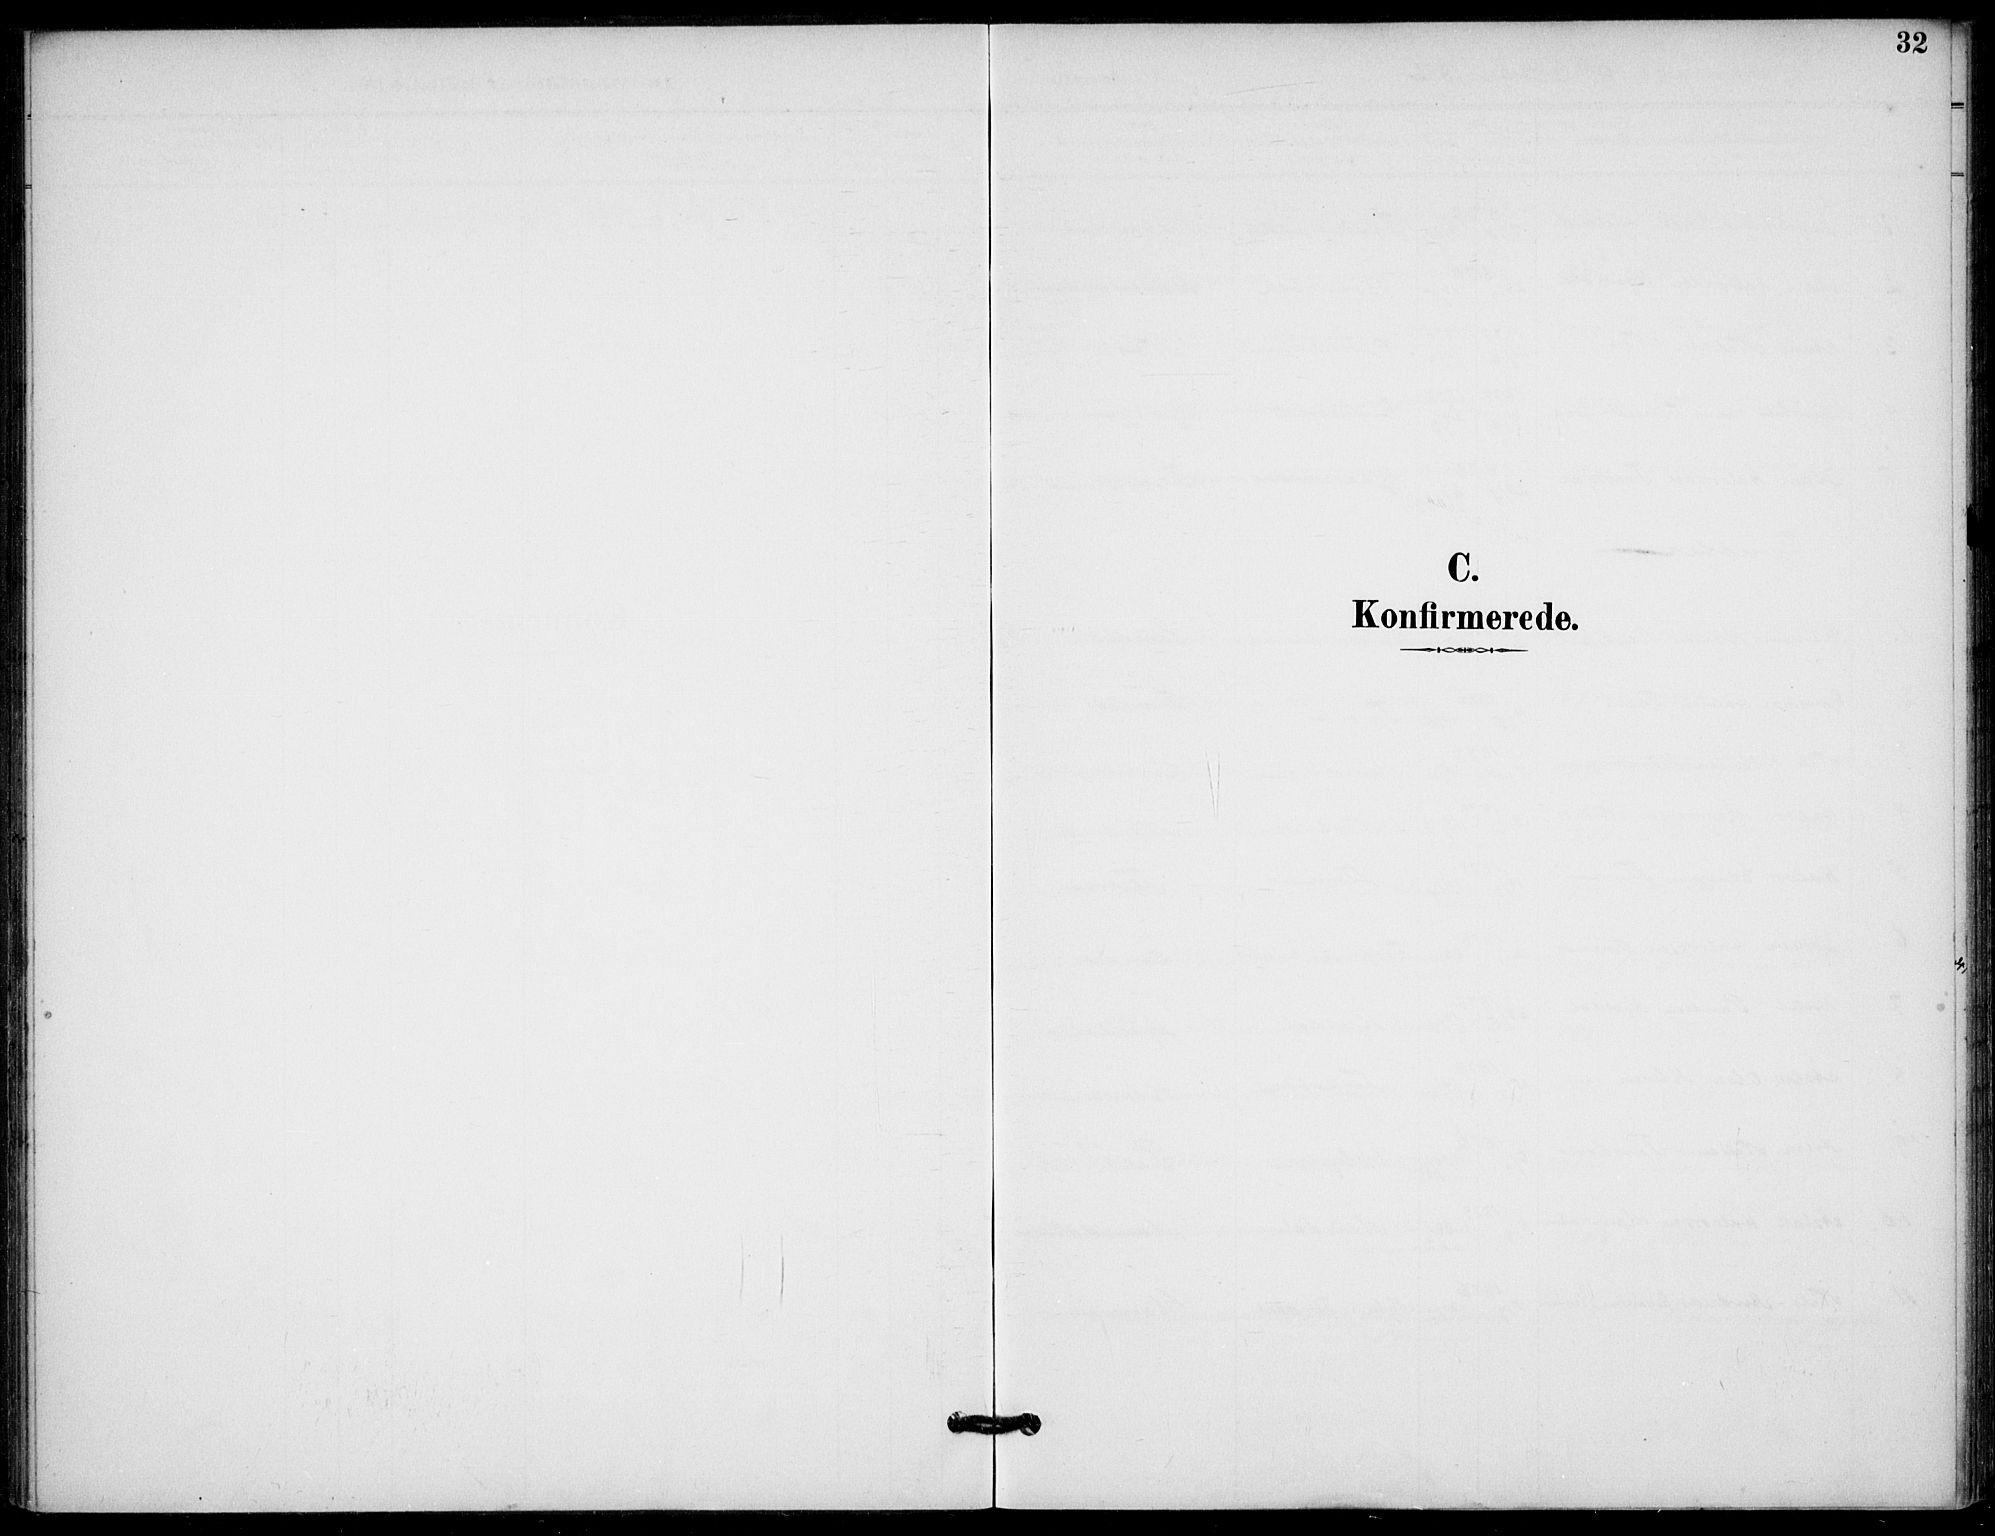 SAKO, Lunde kirkebøker, F/Fb/L0004: Ministerialbok nr. II 4, 1892-1907, s. 32